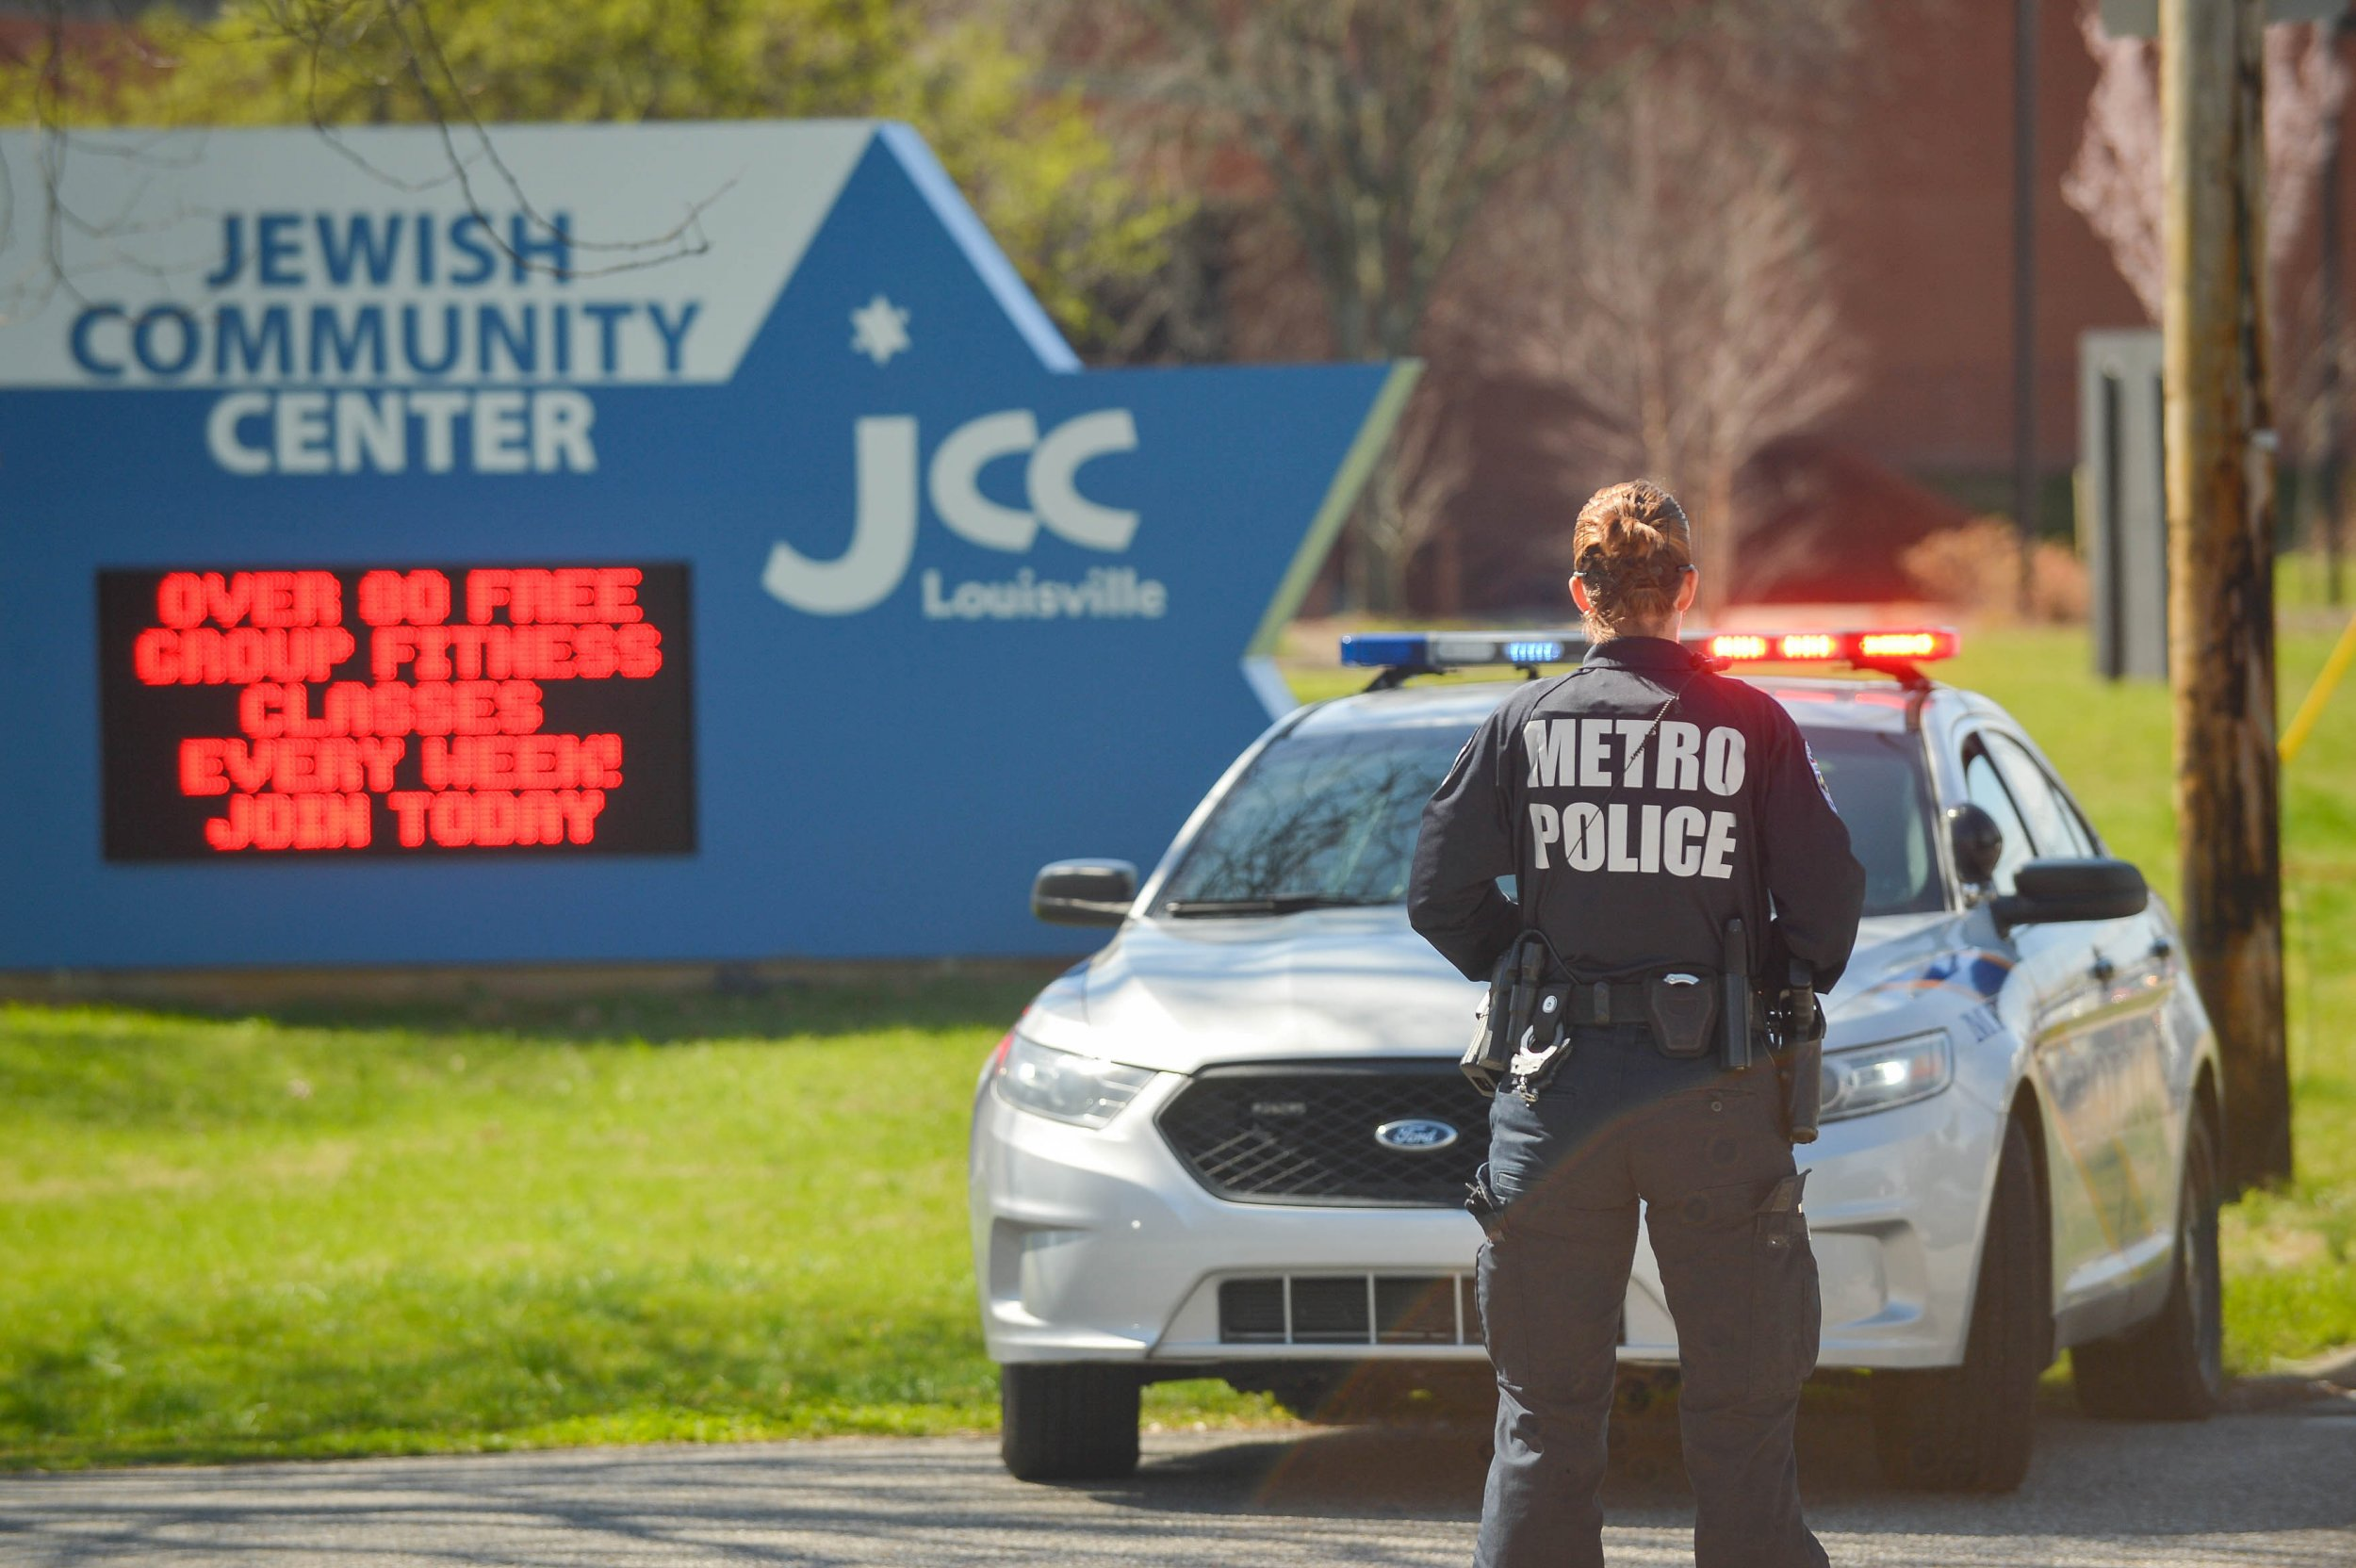 Jewish Groups Bomb Threats